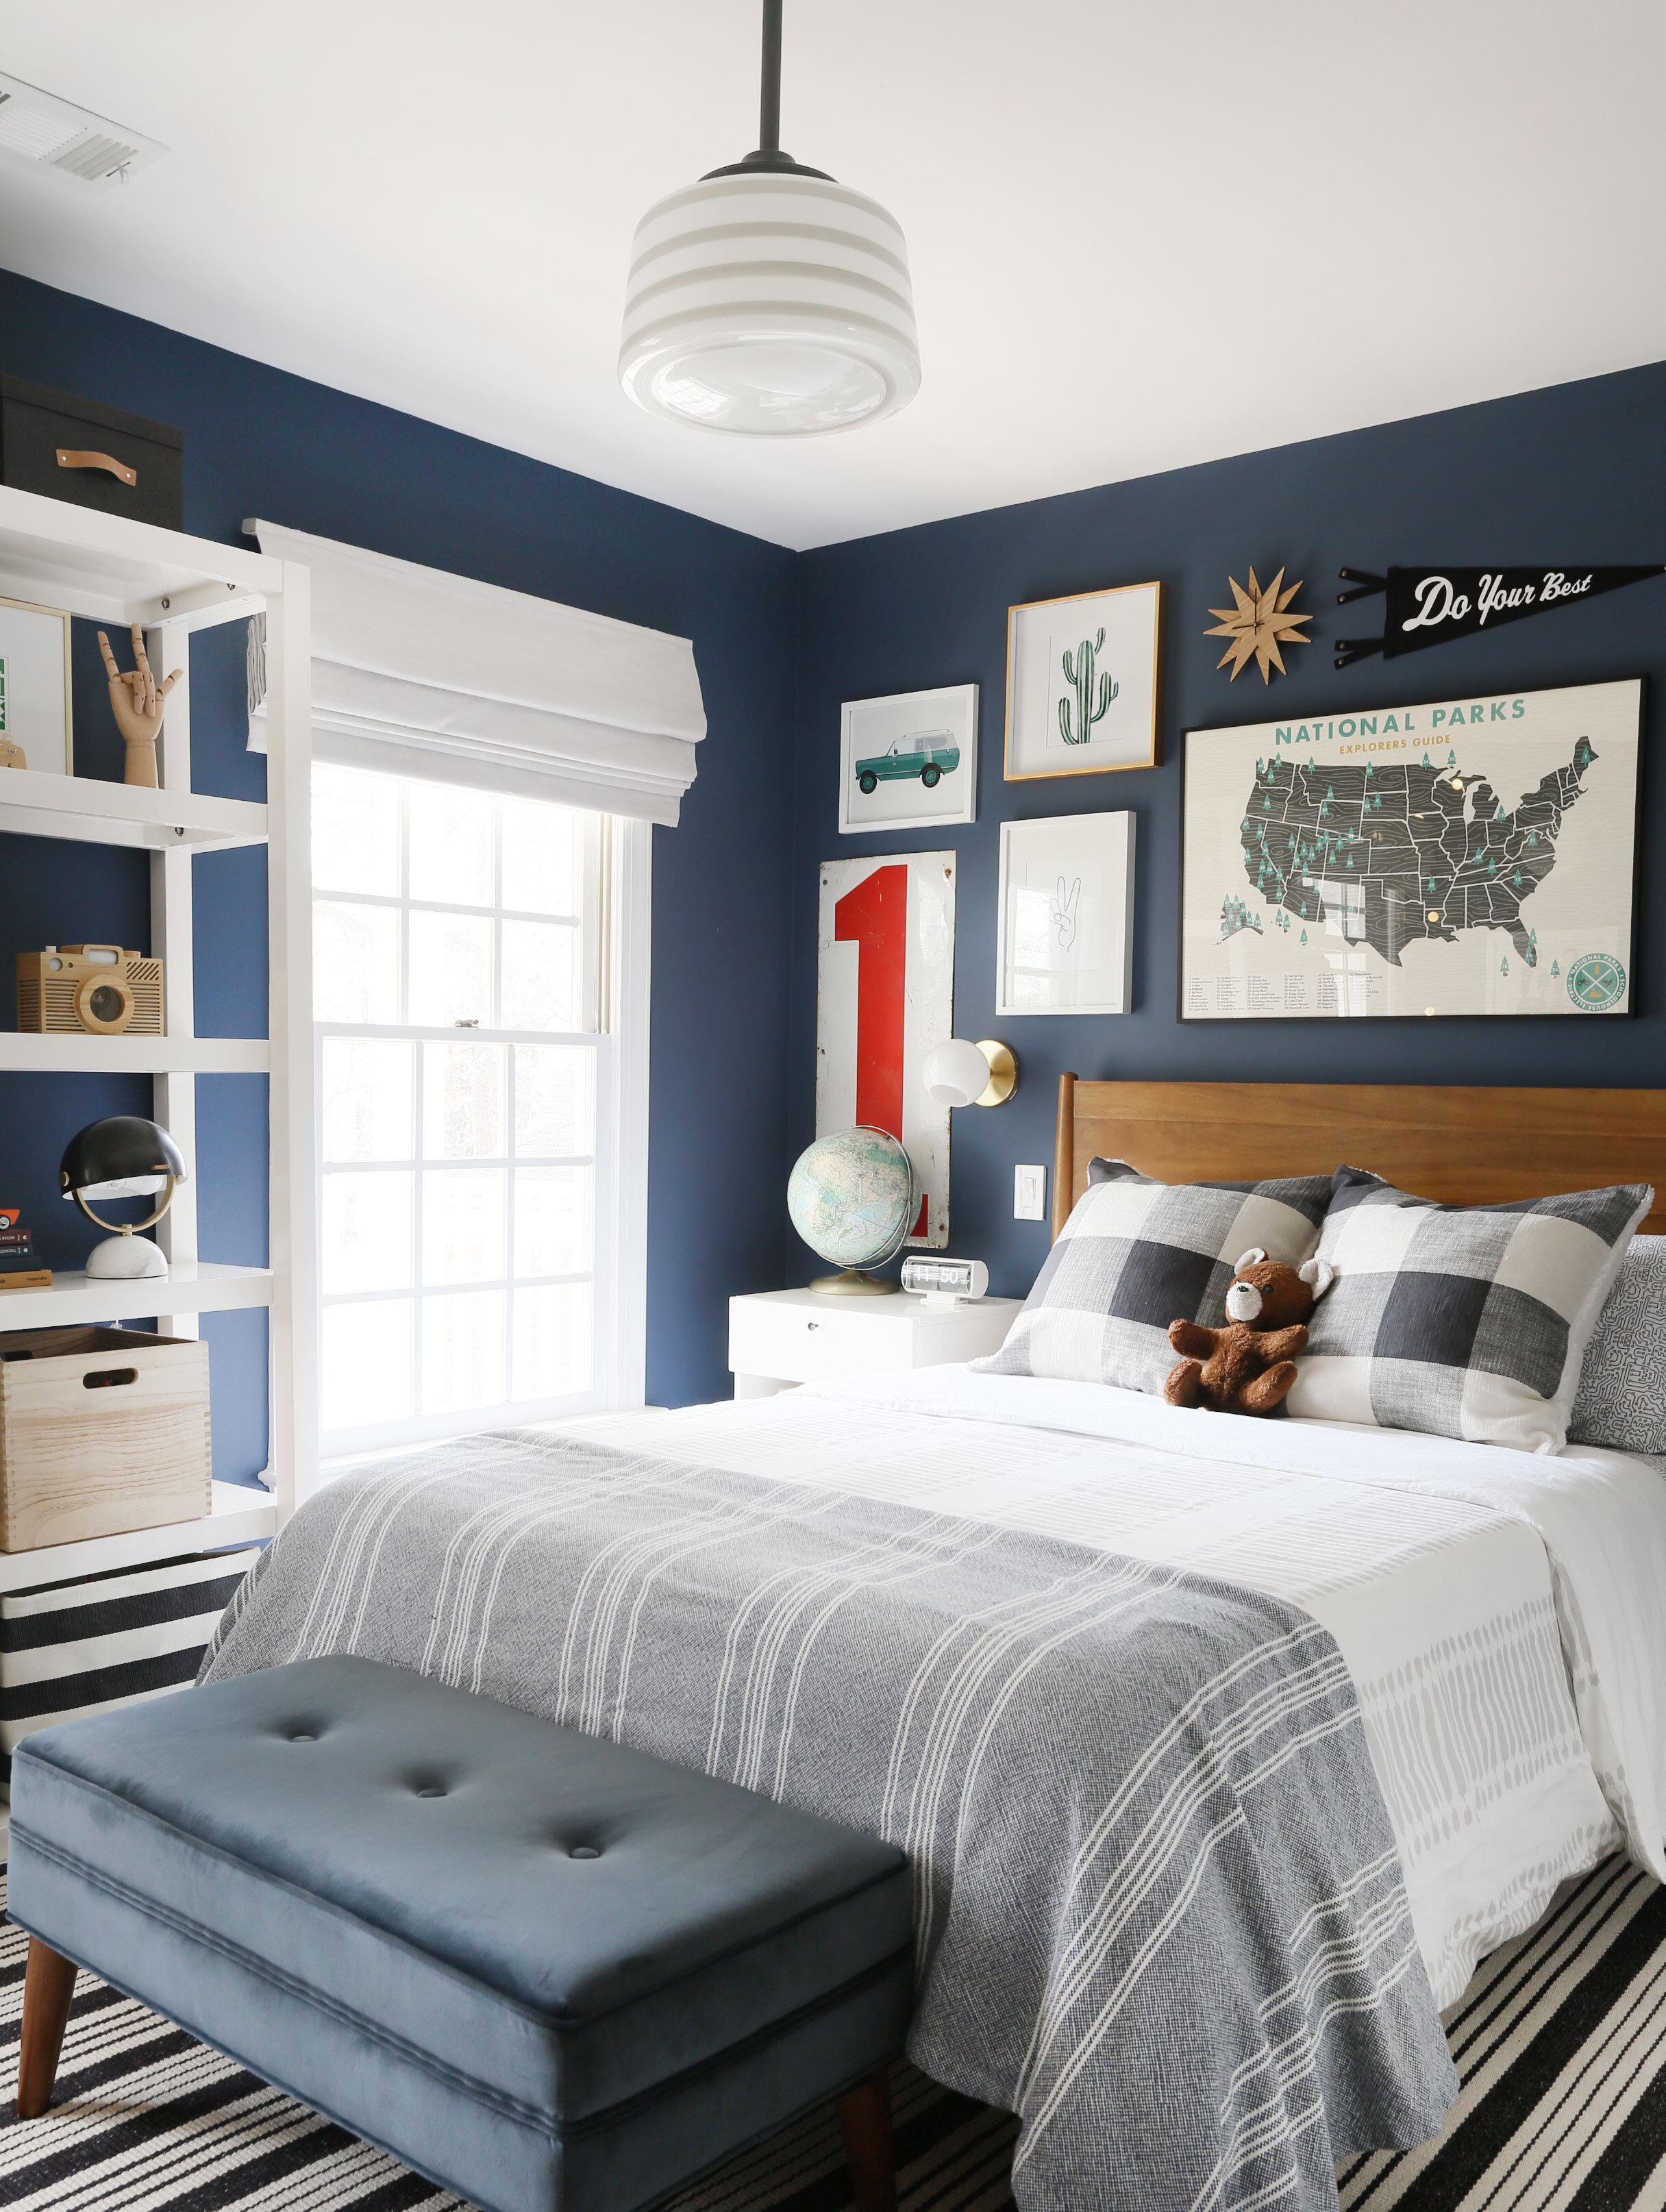 schoolhouse lighting in kid's bedroom by Erin Wheeler of Sunny Circle Studio